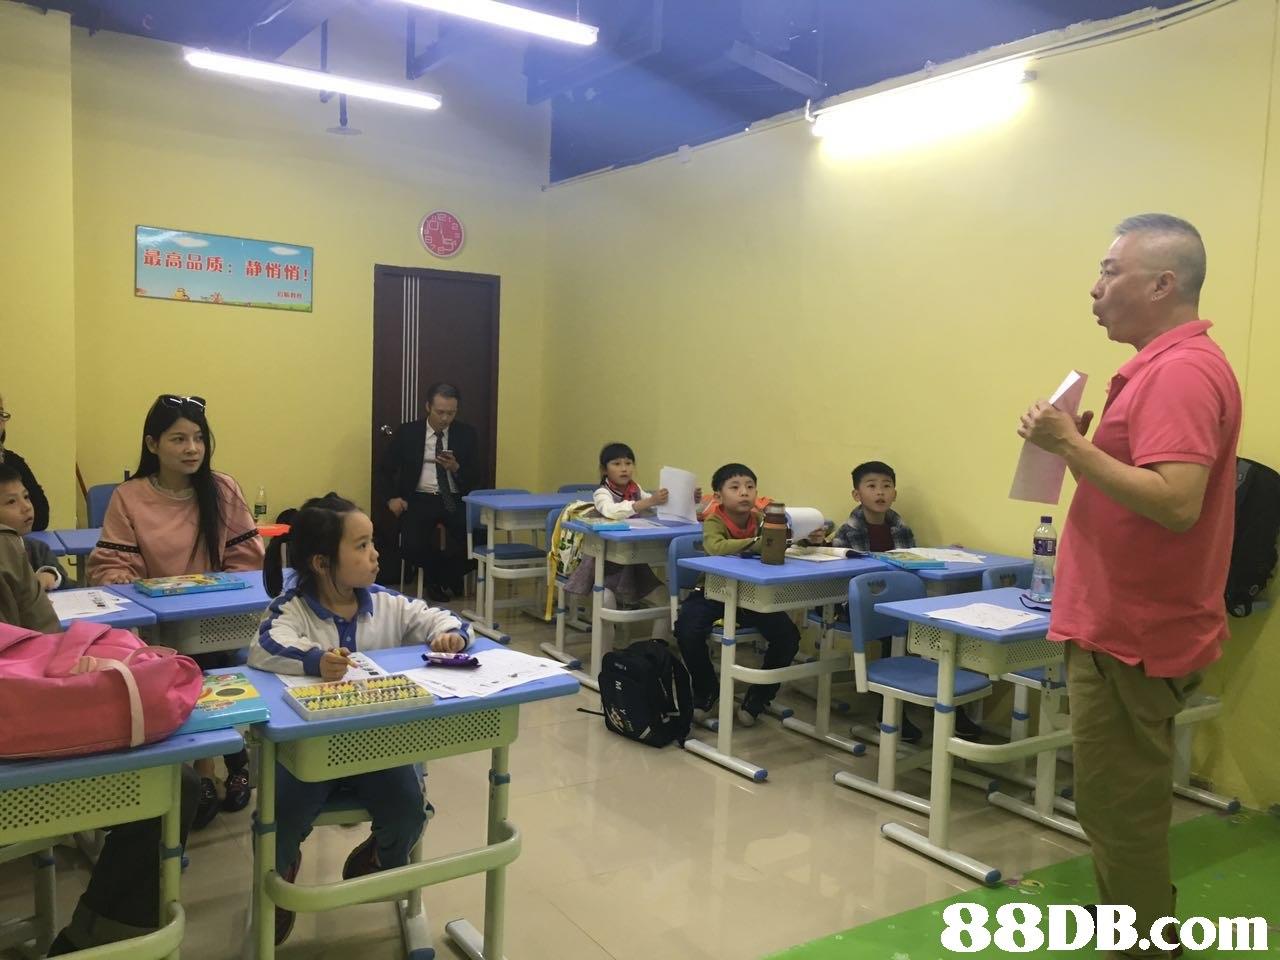 最高品质: 静悄悄! 88DB.com  training